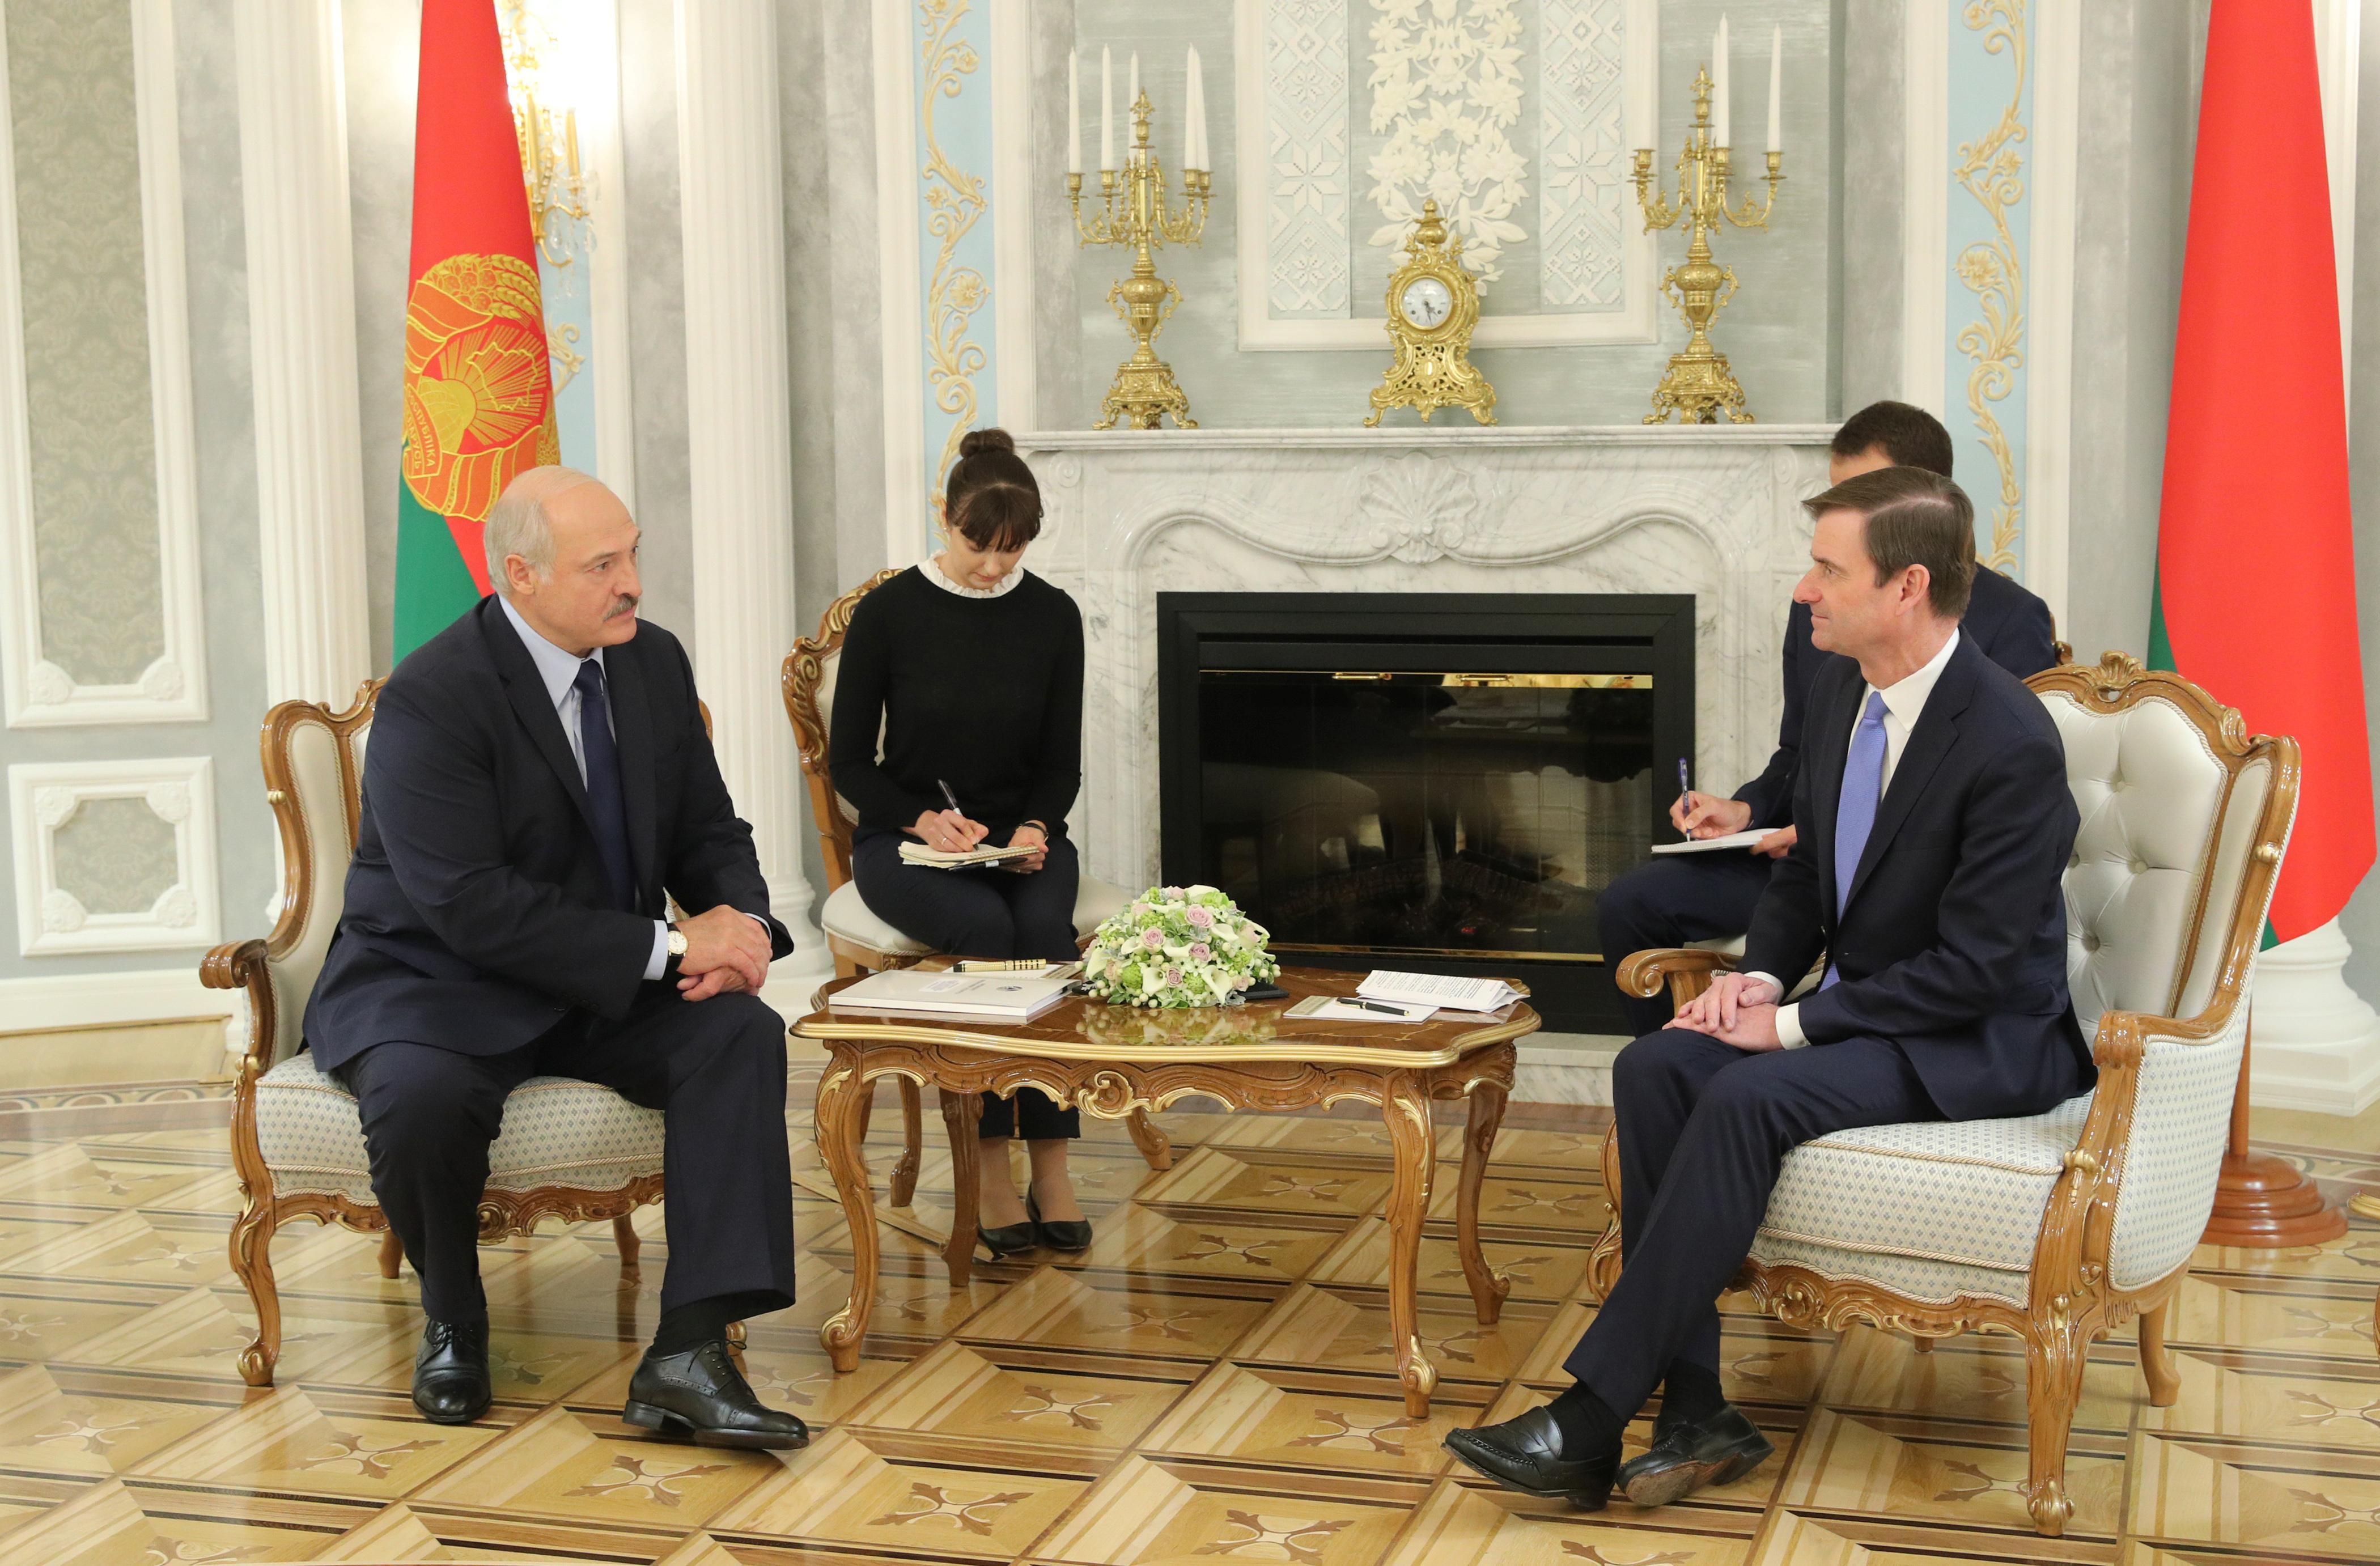 Belarus, U.S. look to bring back ambassadors after 10-year hiatus